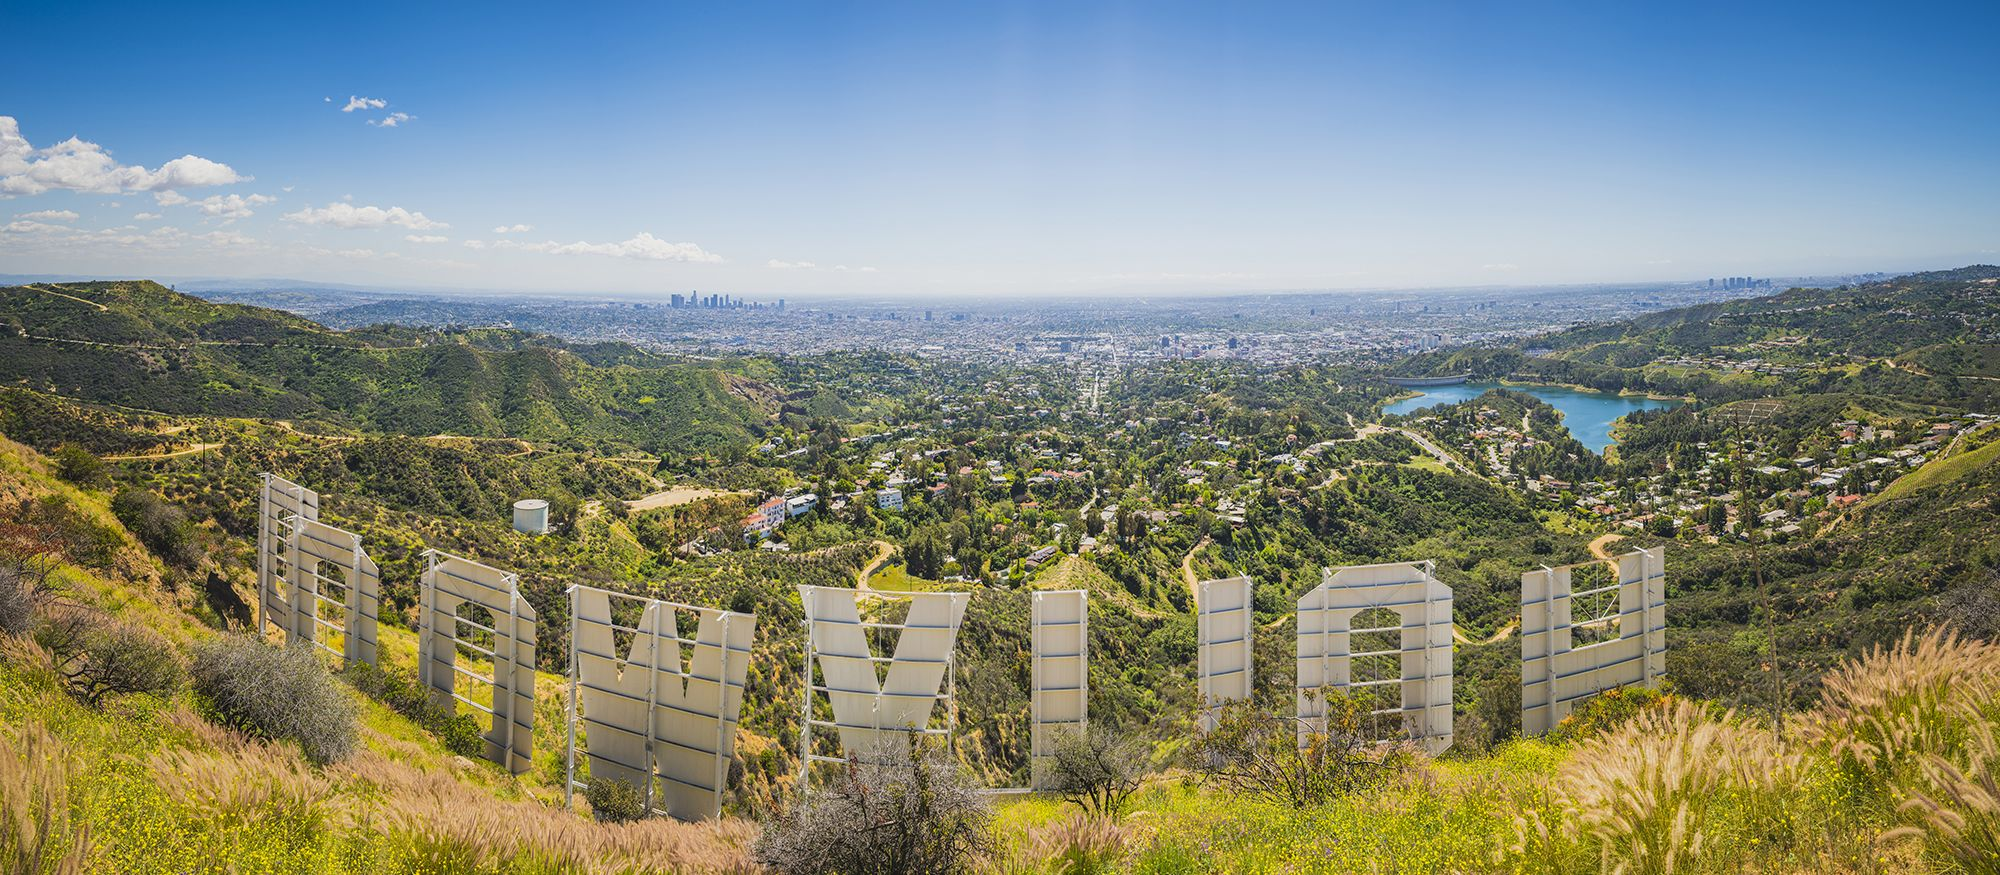 Das Hollywood Sign in Los Angeles